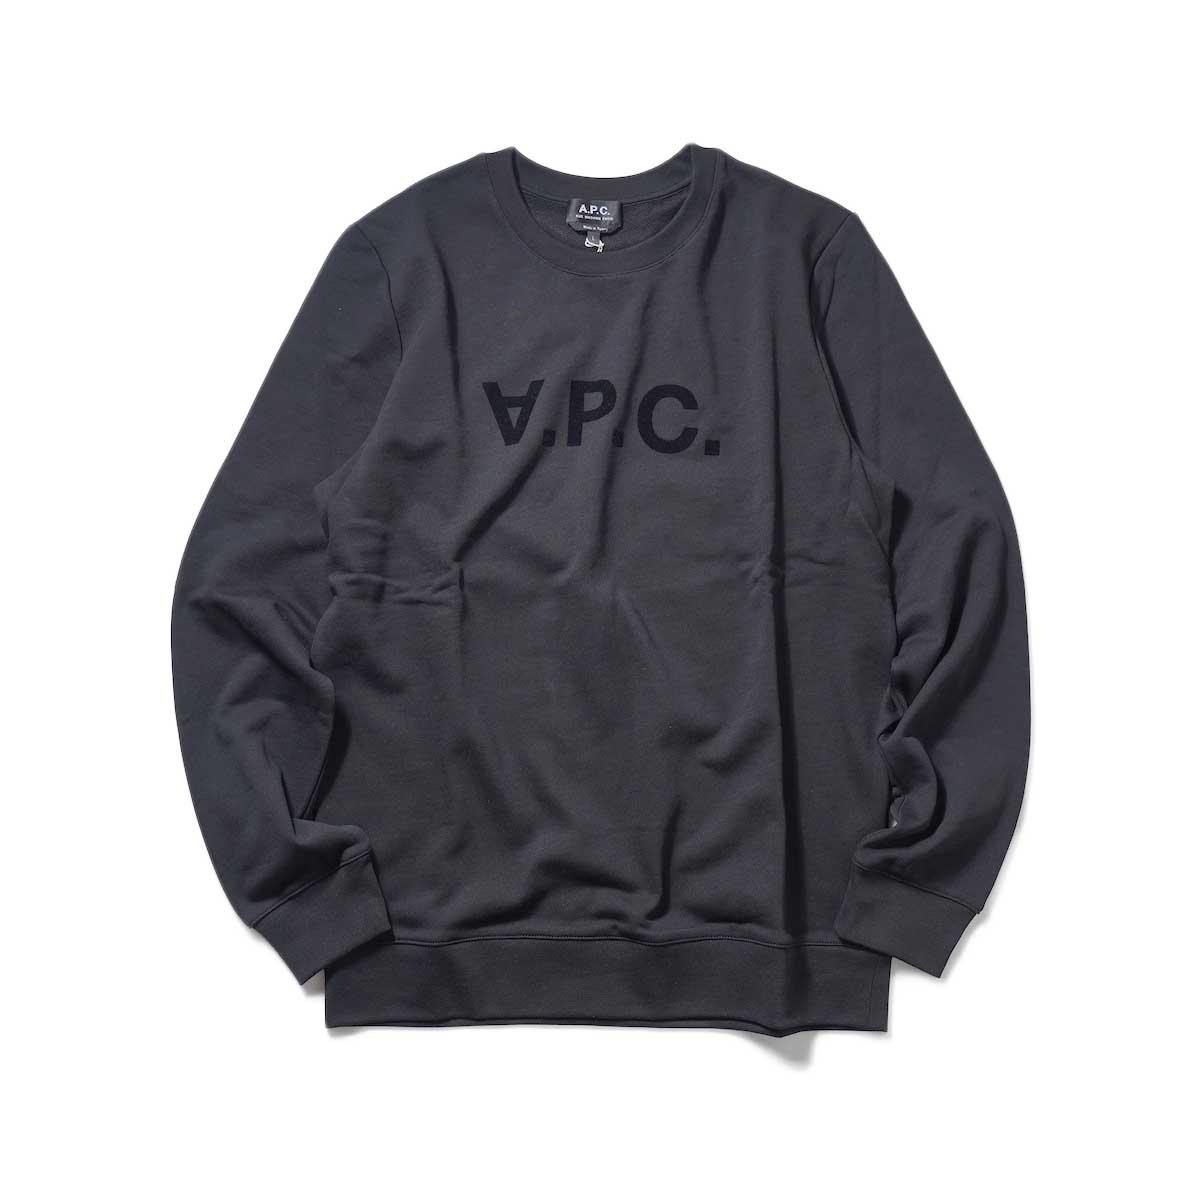 A.P.C. / VPC スウェットシャツ (Black)